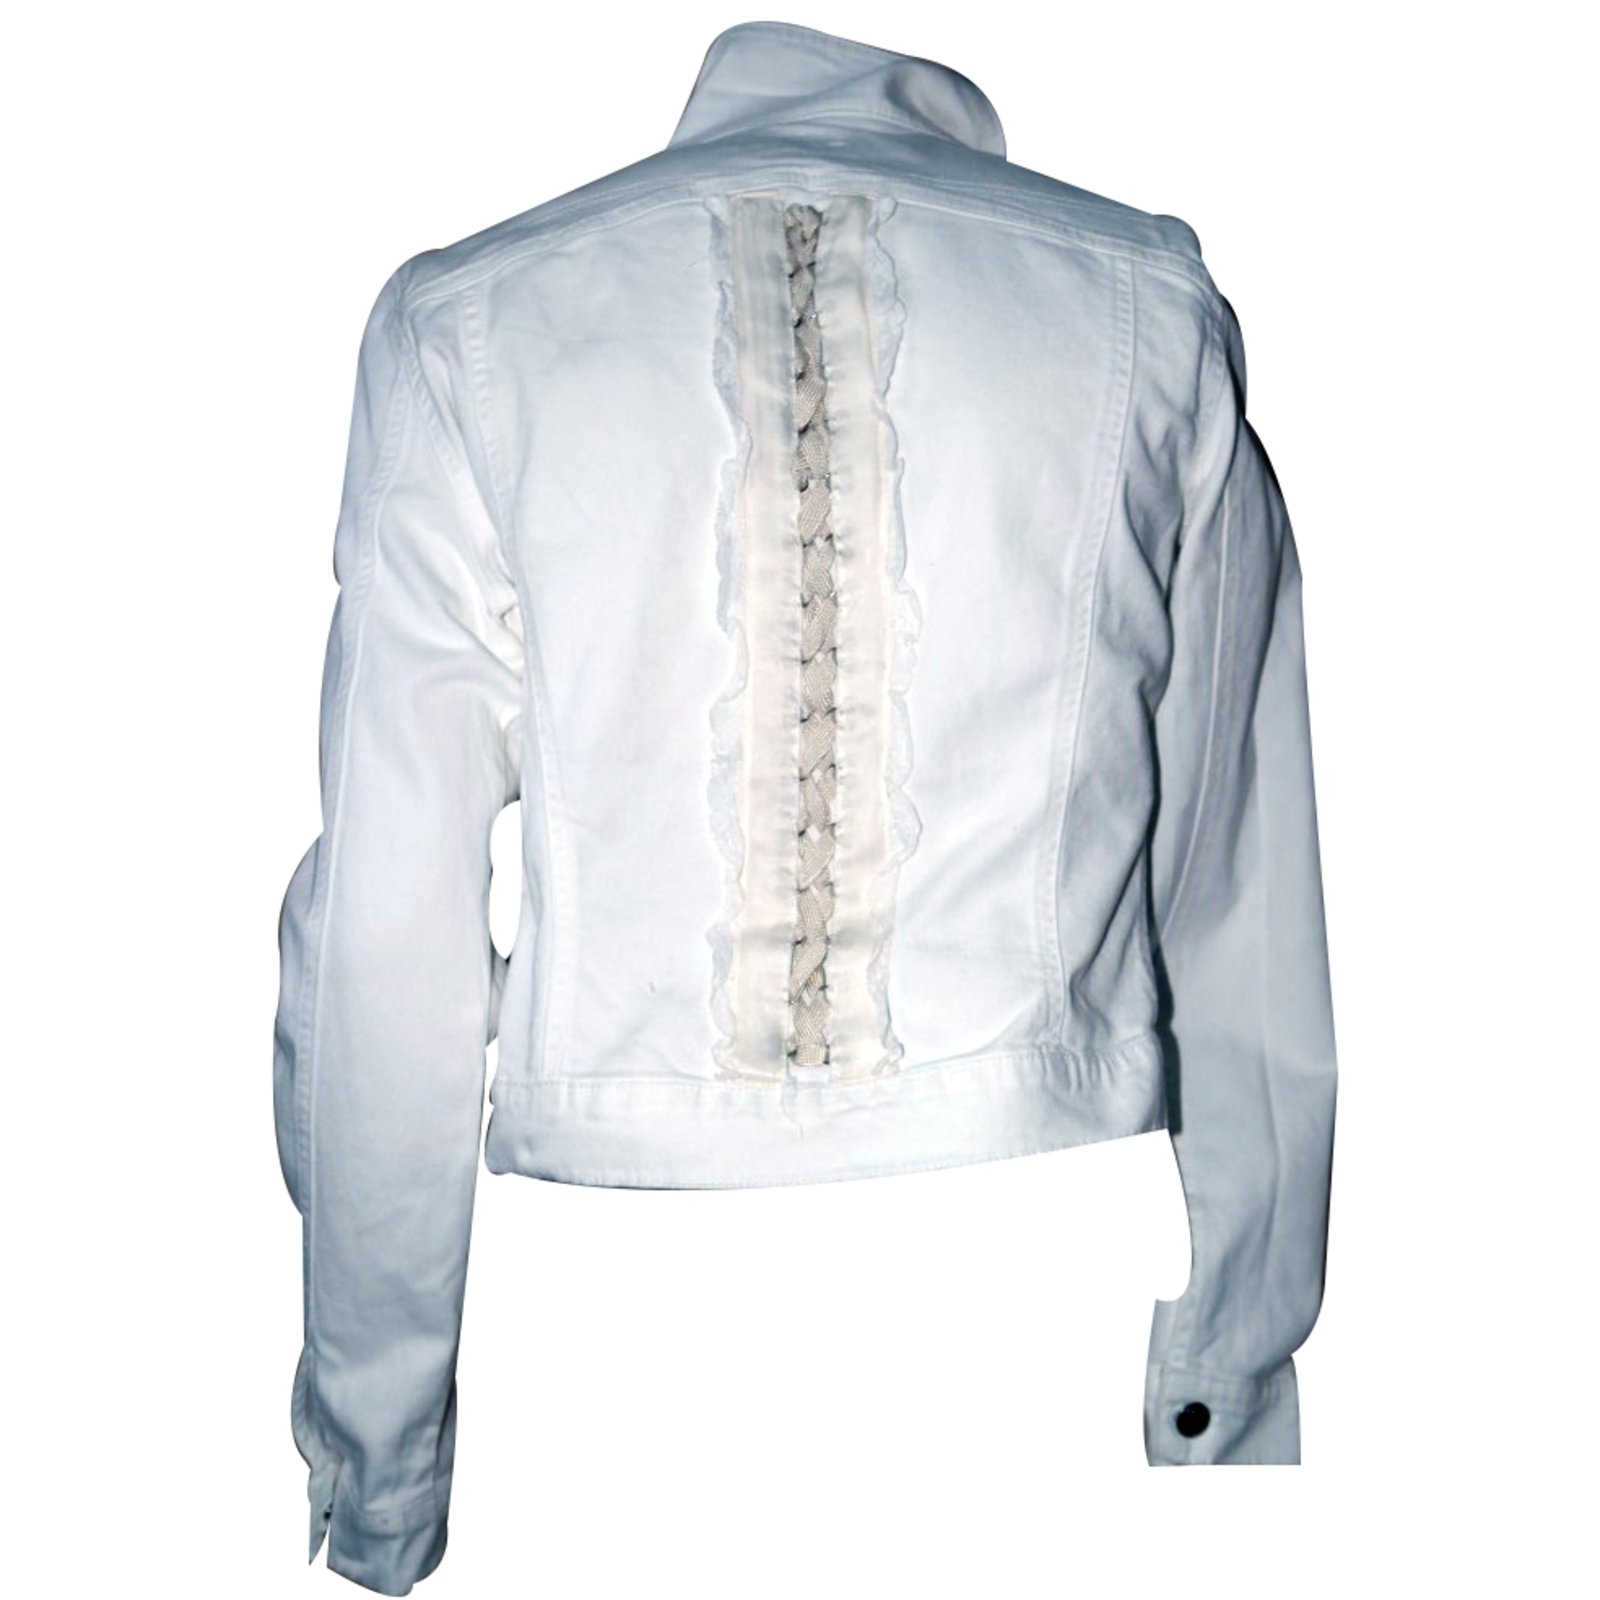 Ref Blanc Closet Veste Jean Joli Vestes 22349 Blumarine AIqaOO